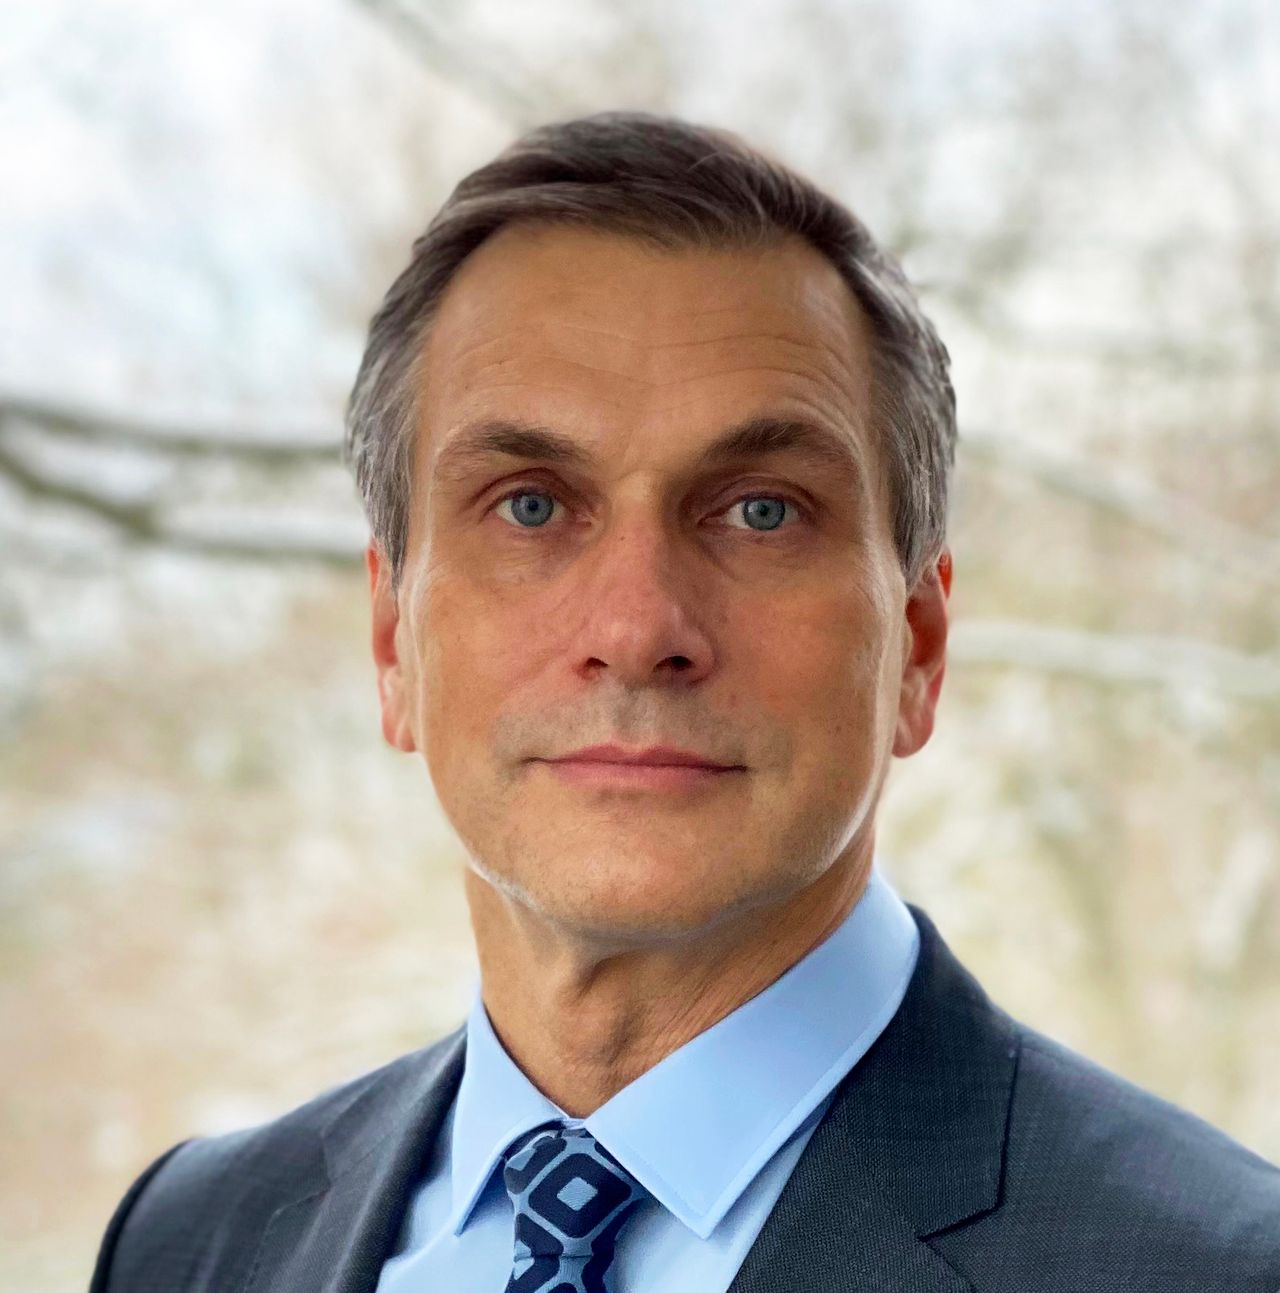 Michael Menneking CEO of Automation Engineering